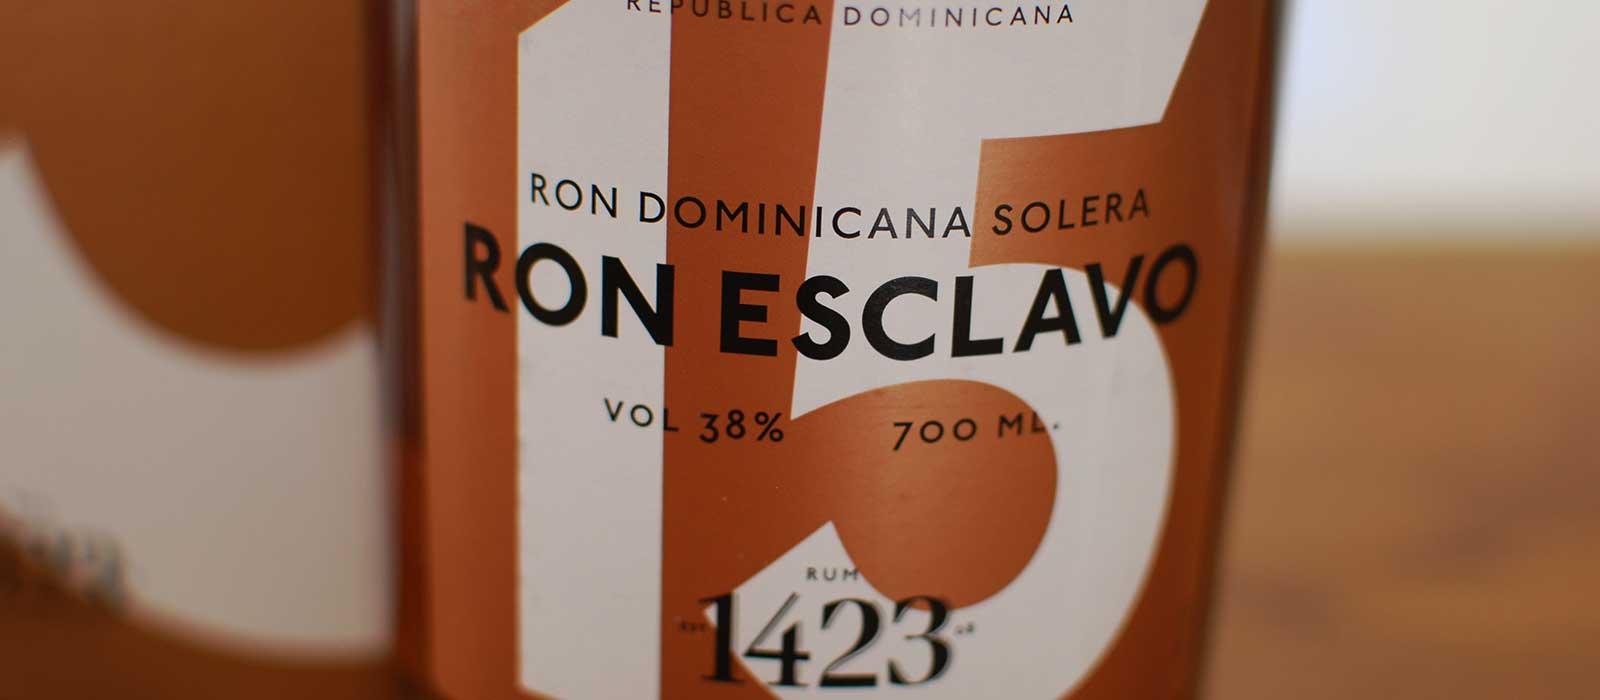 Femte plats 2015: Ron Esclavo 15